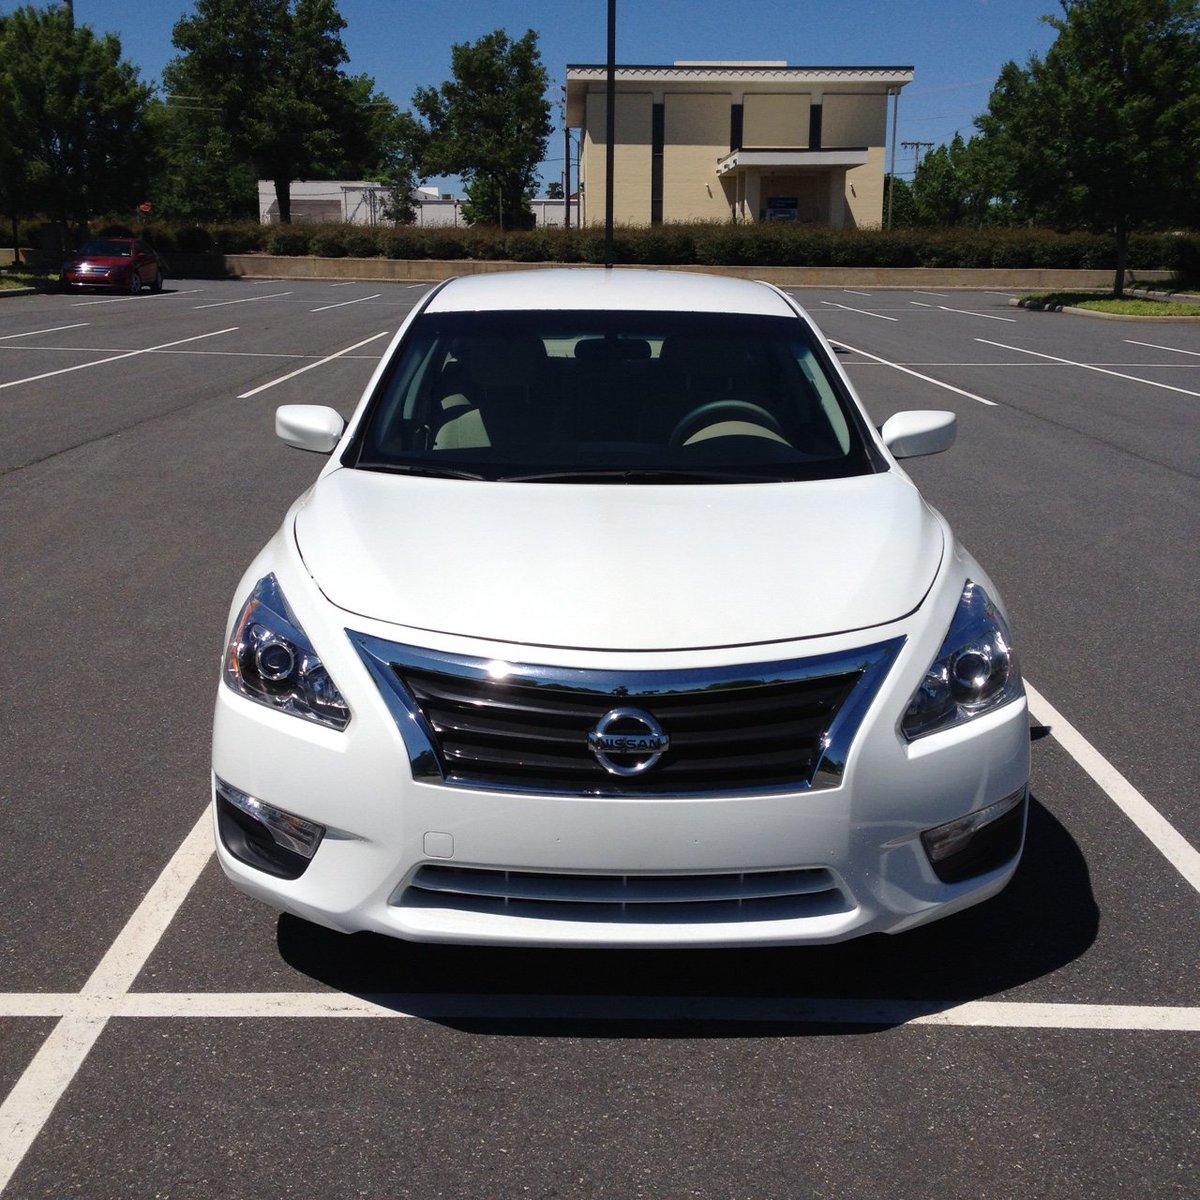 2015 Nissan Altima 2.5S Nice car low mileage: 49000 (salvage) Features: backup camera, Bluetooth, XM radio, USB, etc. Cash:$9500 or financepic.twitter.com/ ...